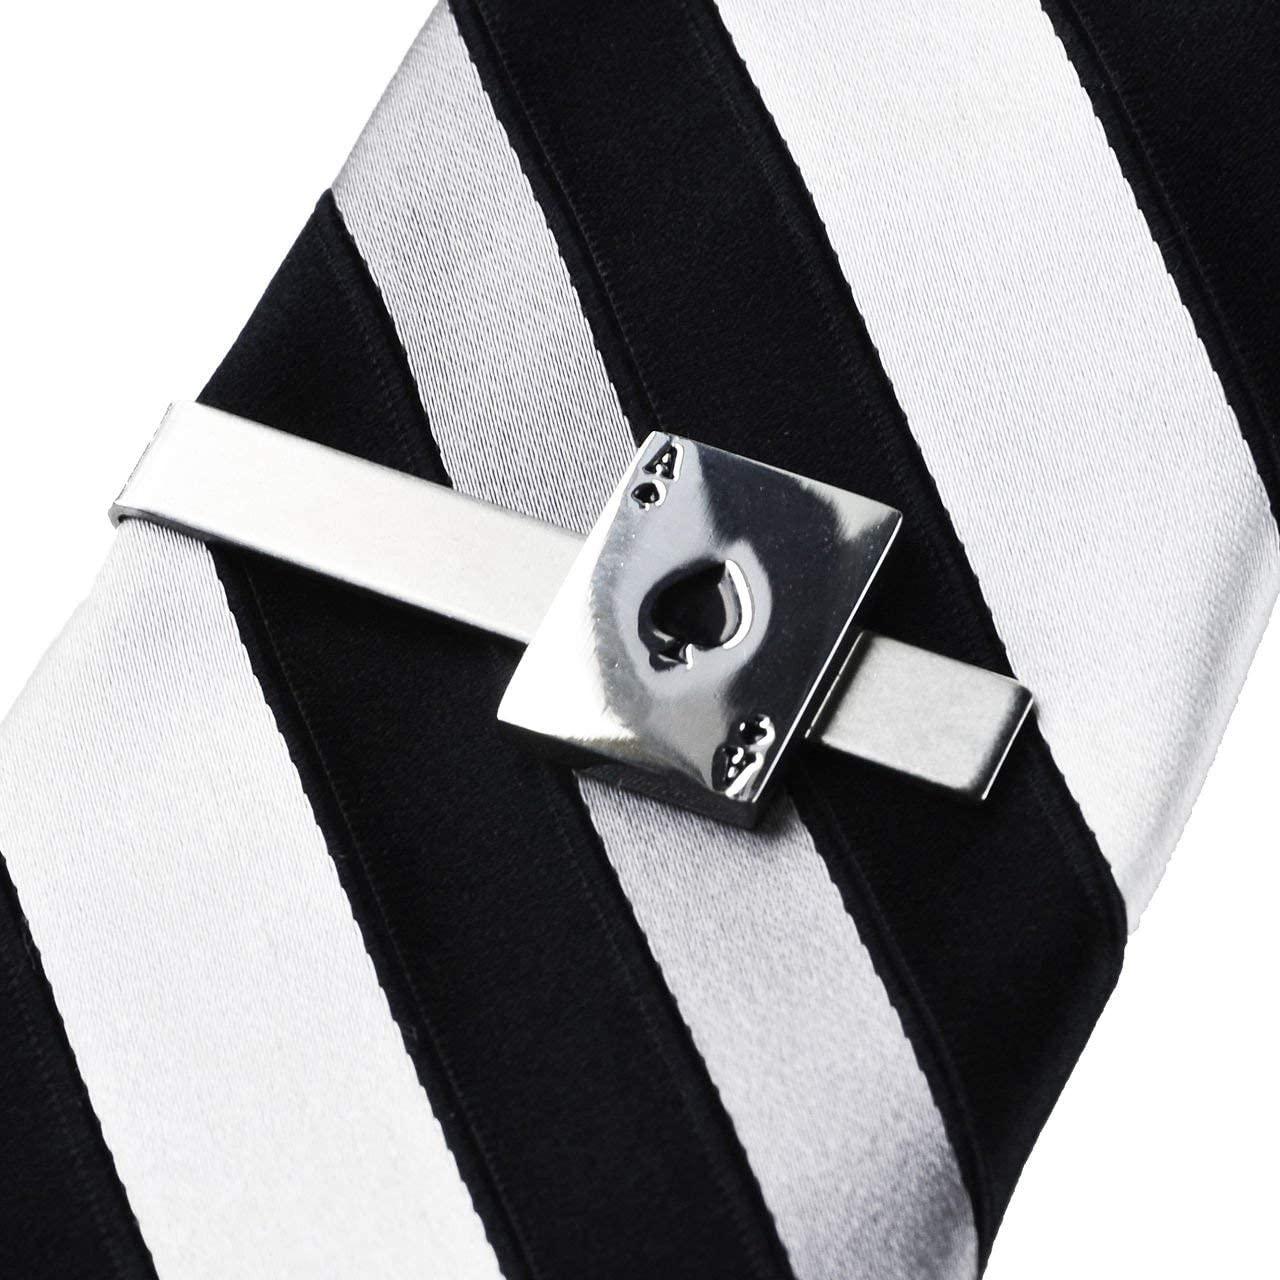 Quality Handcrafts Guaranteed Ace of Spades Tie Clip